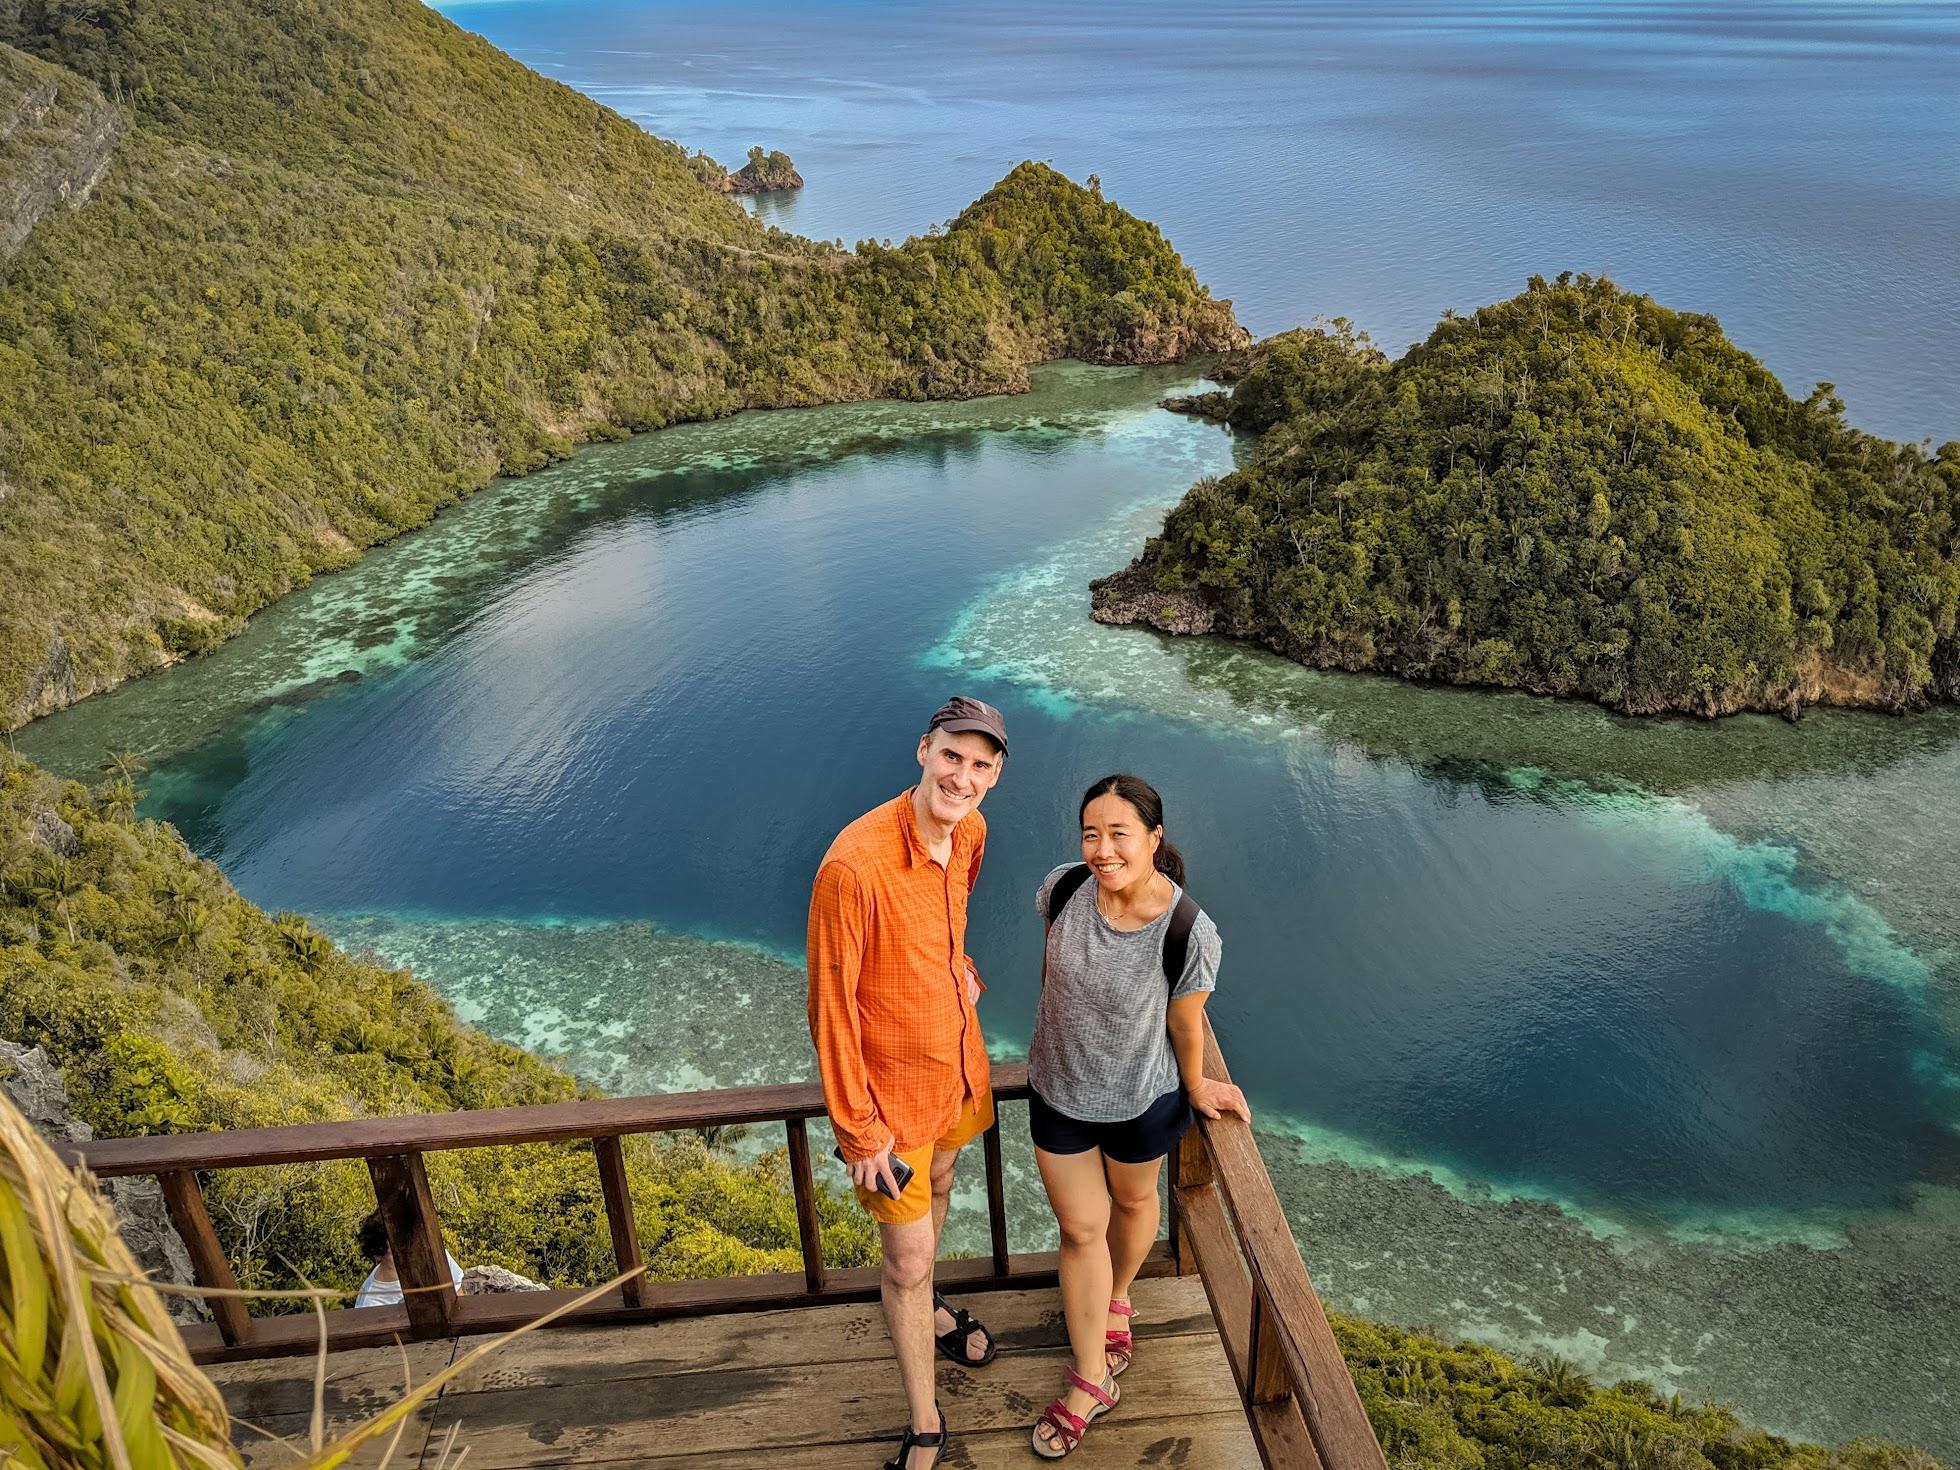 One of the Love Lagoons in Raja Ampat